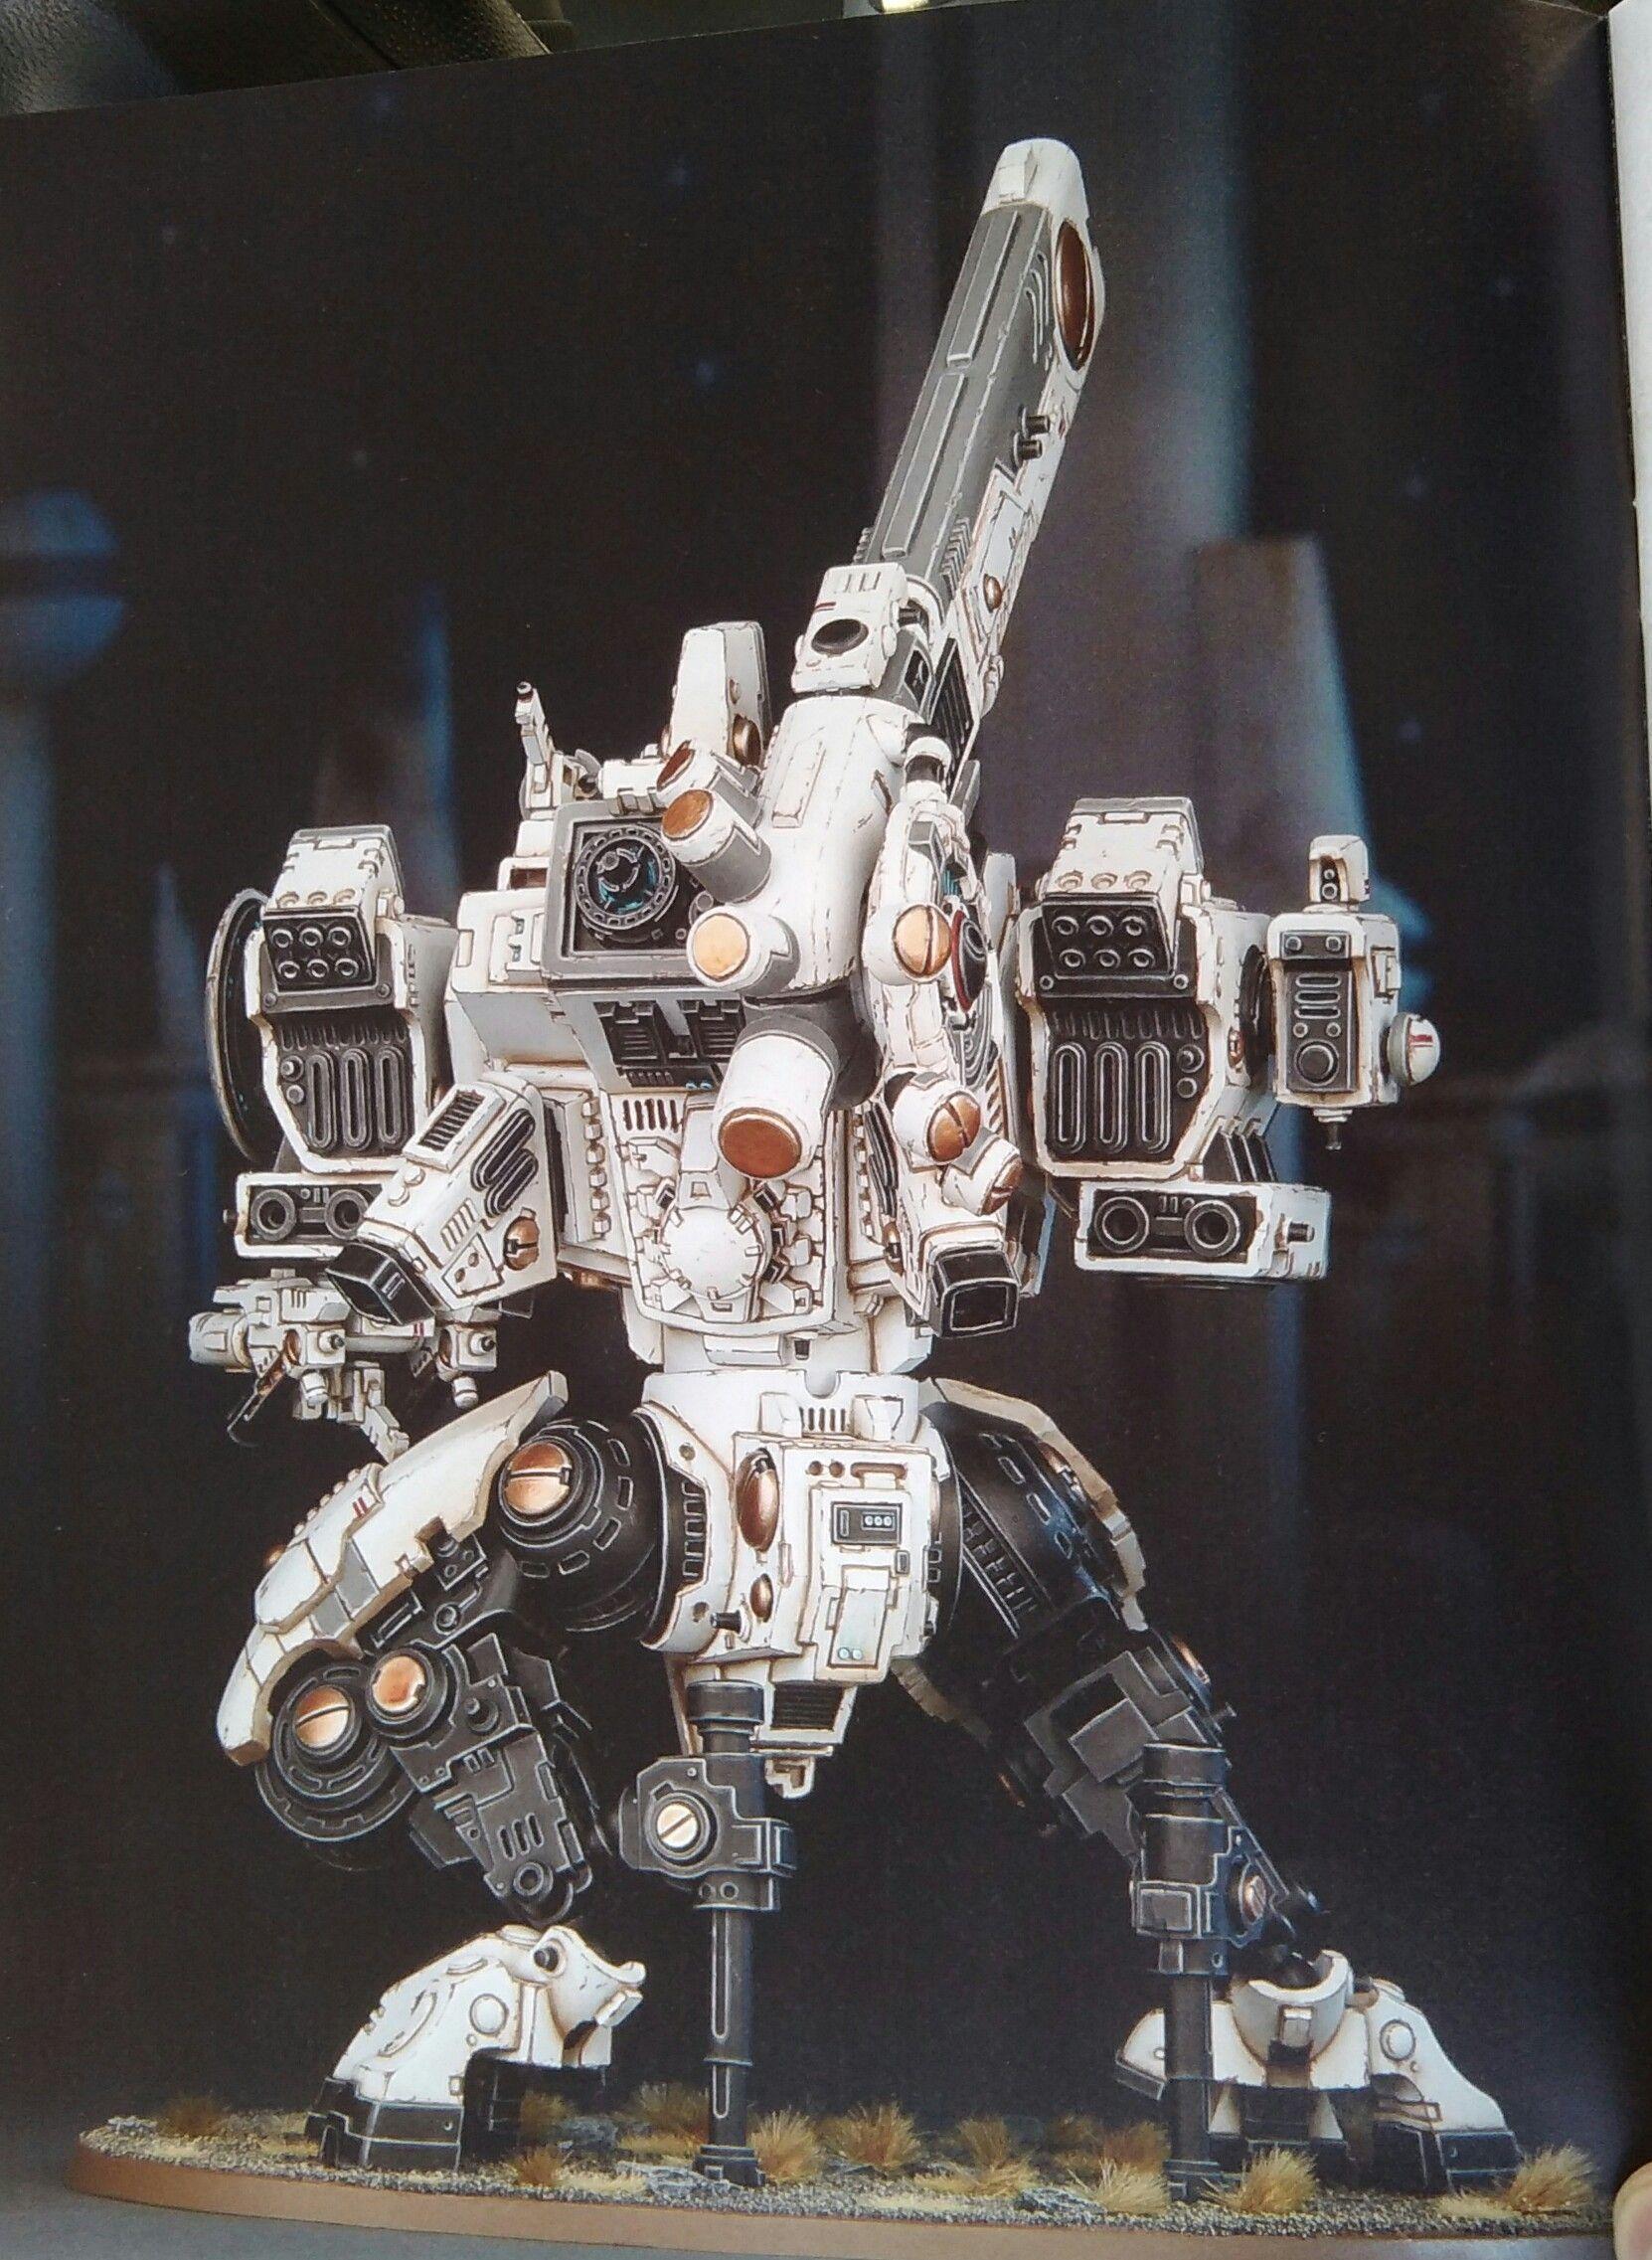 Tau Empire,Tau, Тау,Warhammer 40000,warhammer40000, warhammer40k, warhammer 40k, ваха, сорокотысячник,Wh Песочница,фэндомы,Miniatures (Wh 40000),KV128 Stormsurge